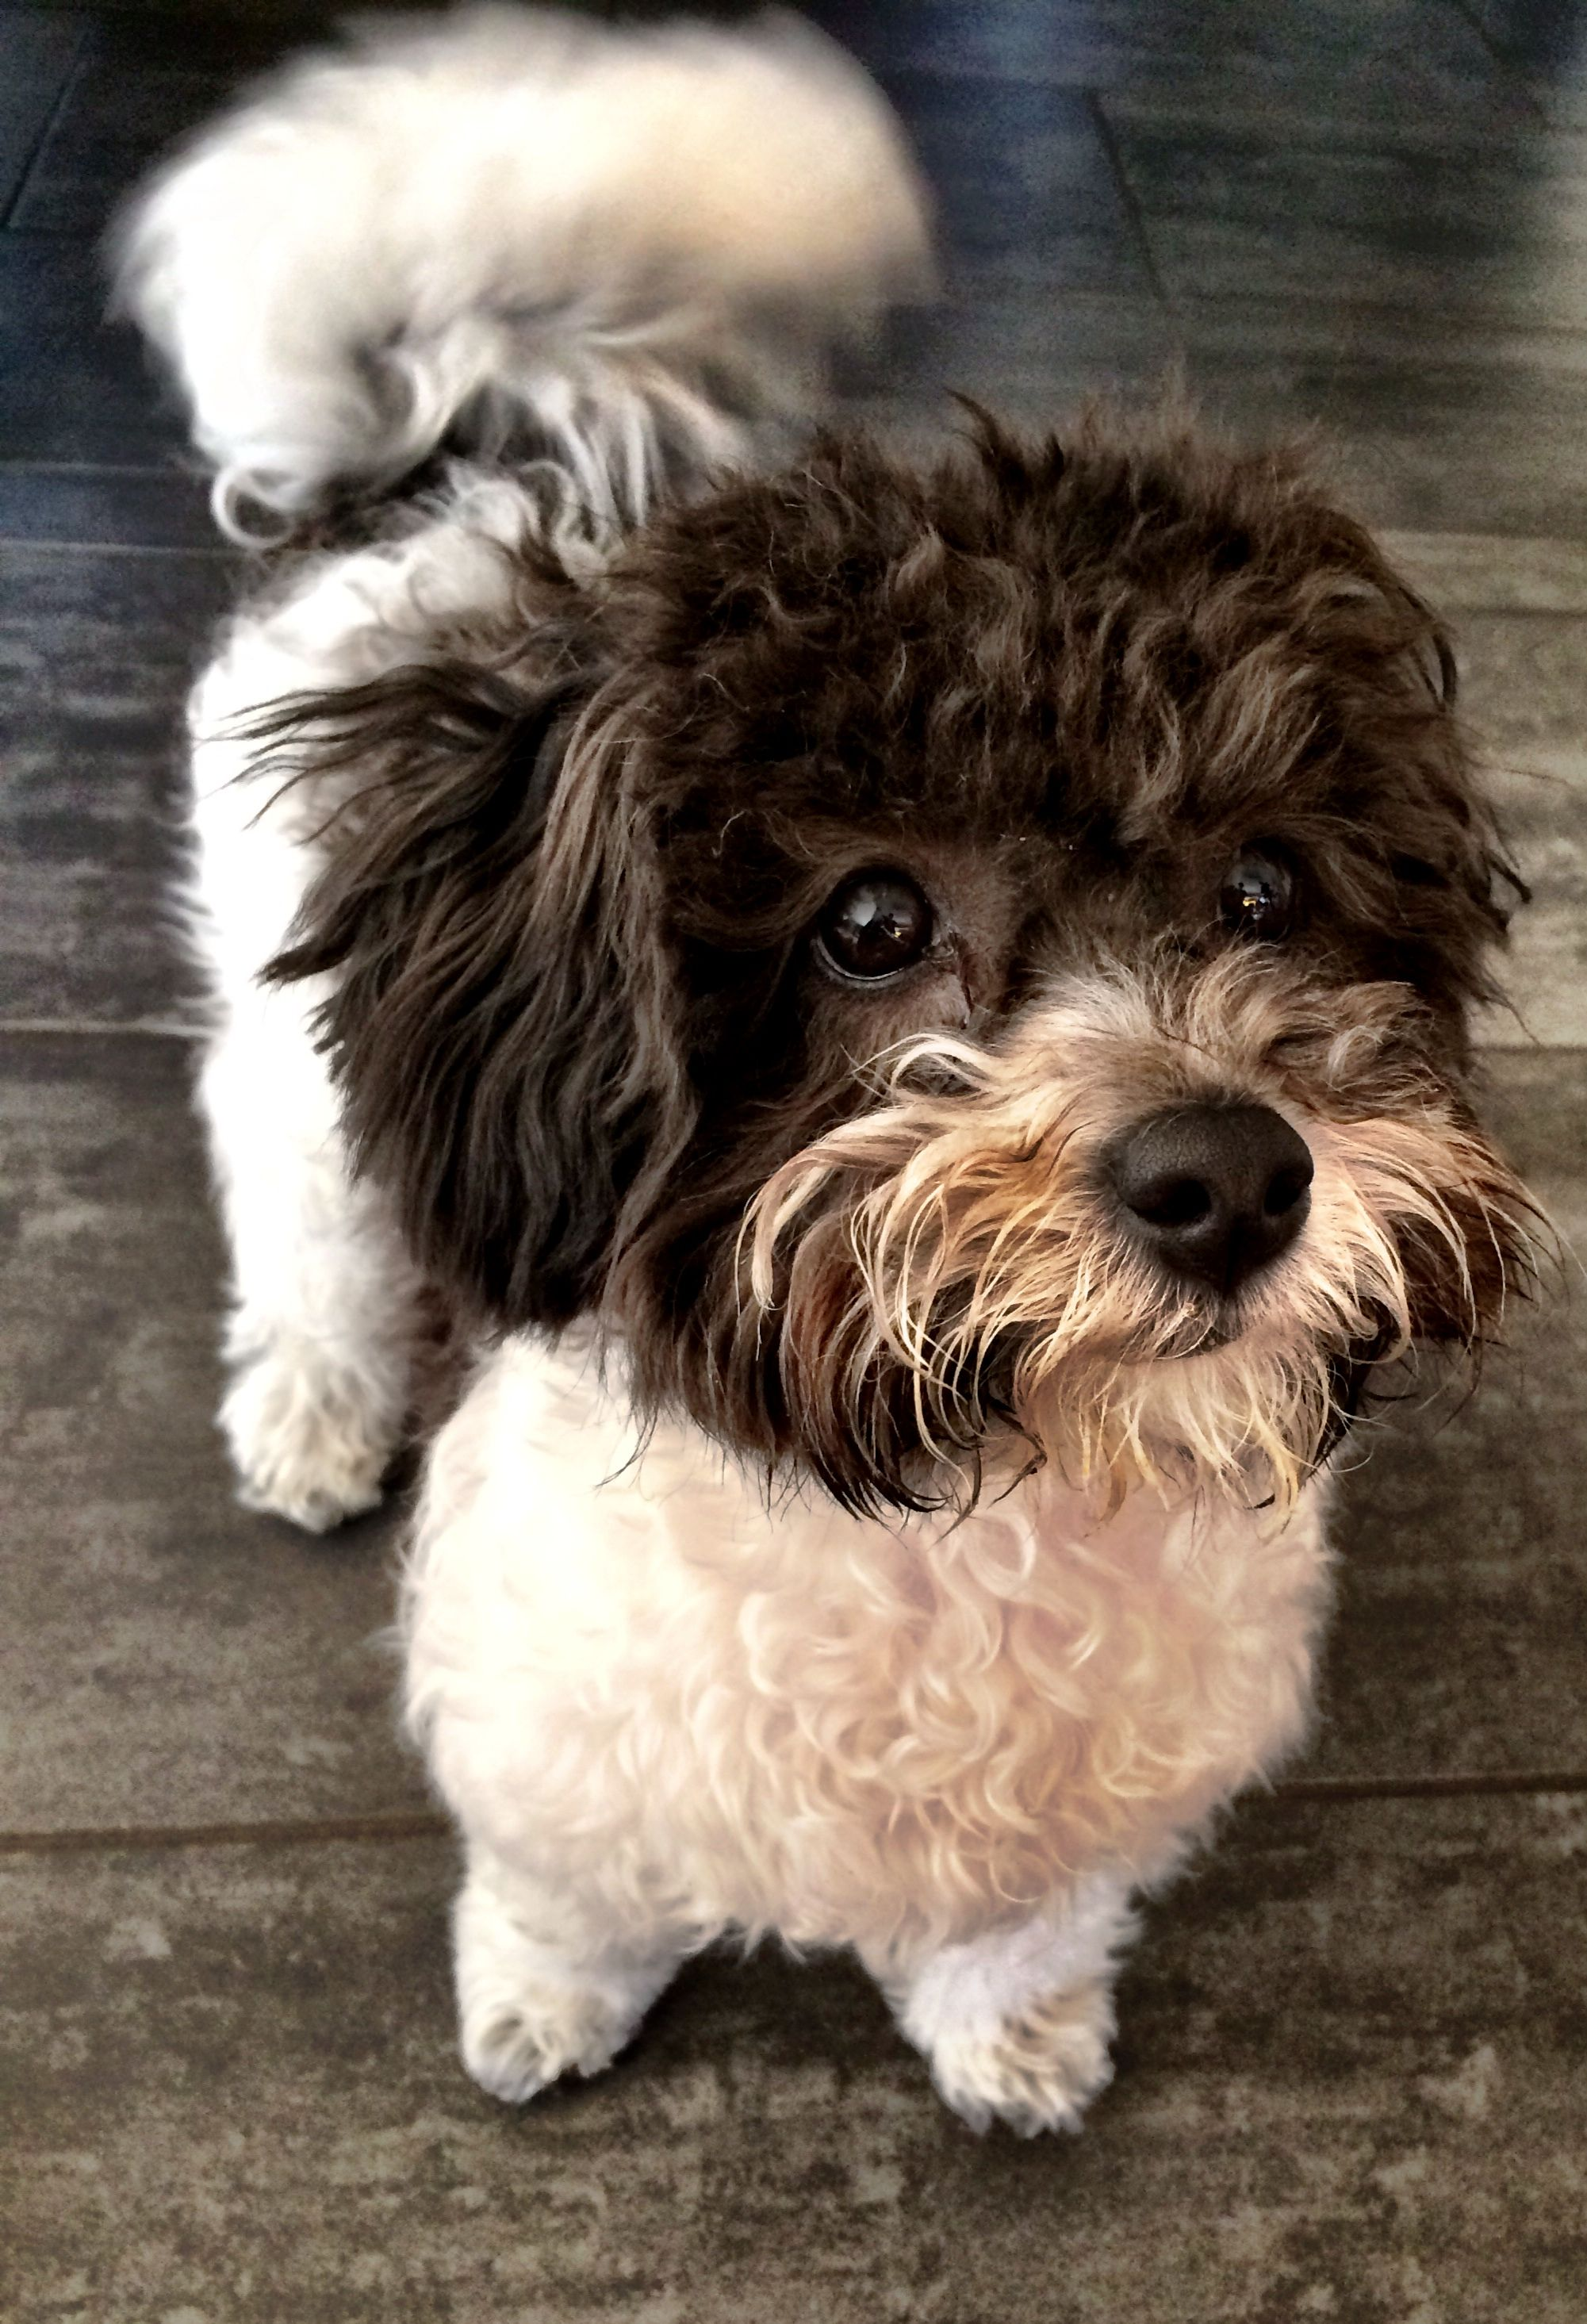 Pin By Hardik Bafna On Punky Bolonka Zwetna Purebred Dogs Dog List Dog Love